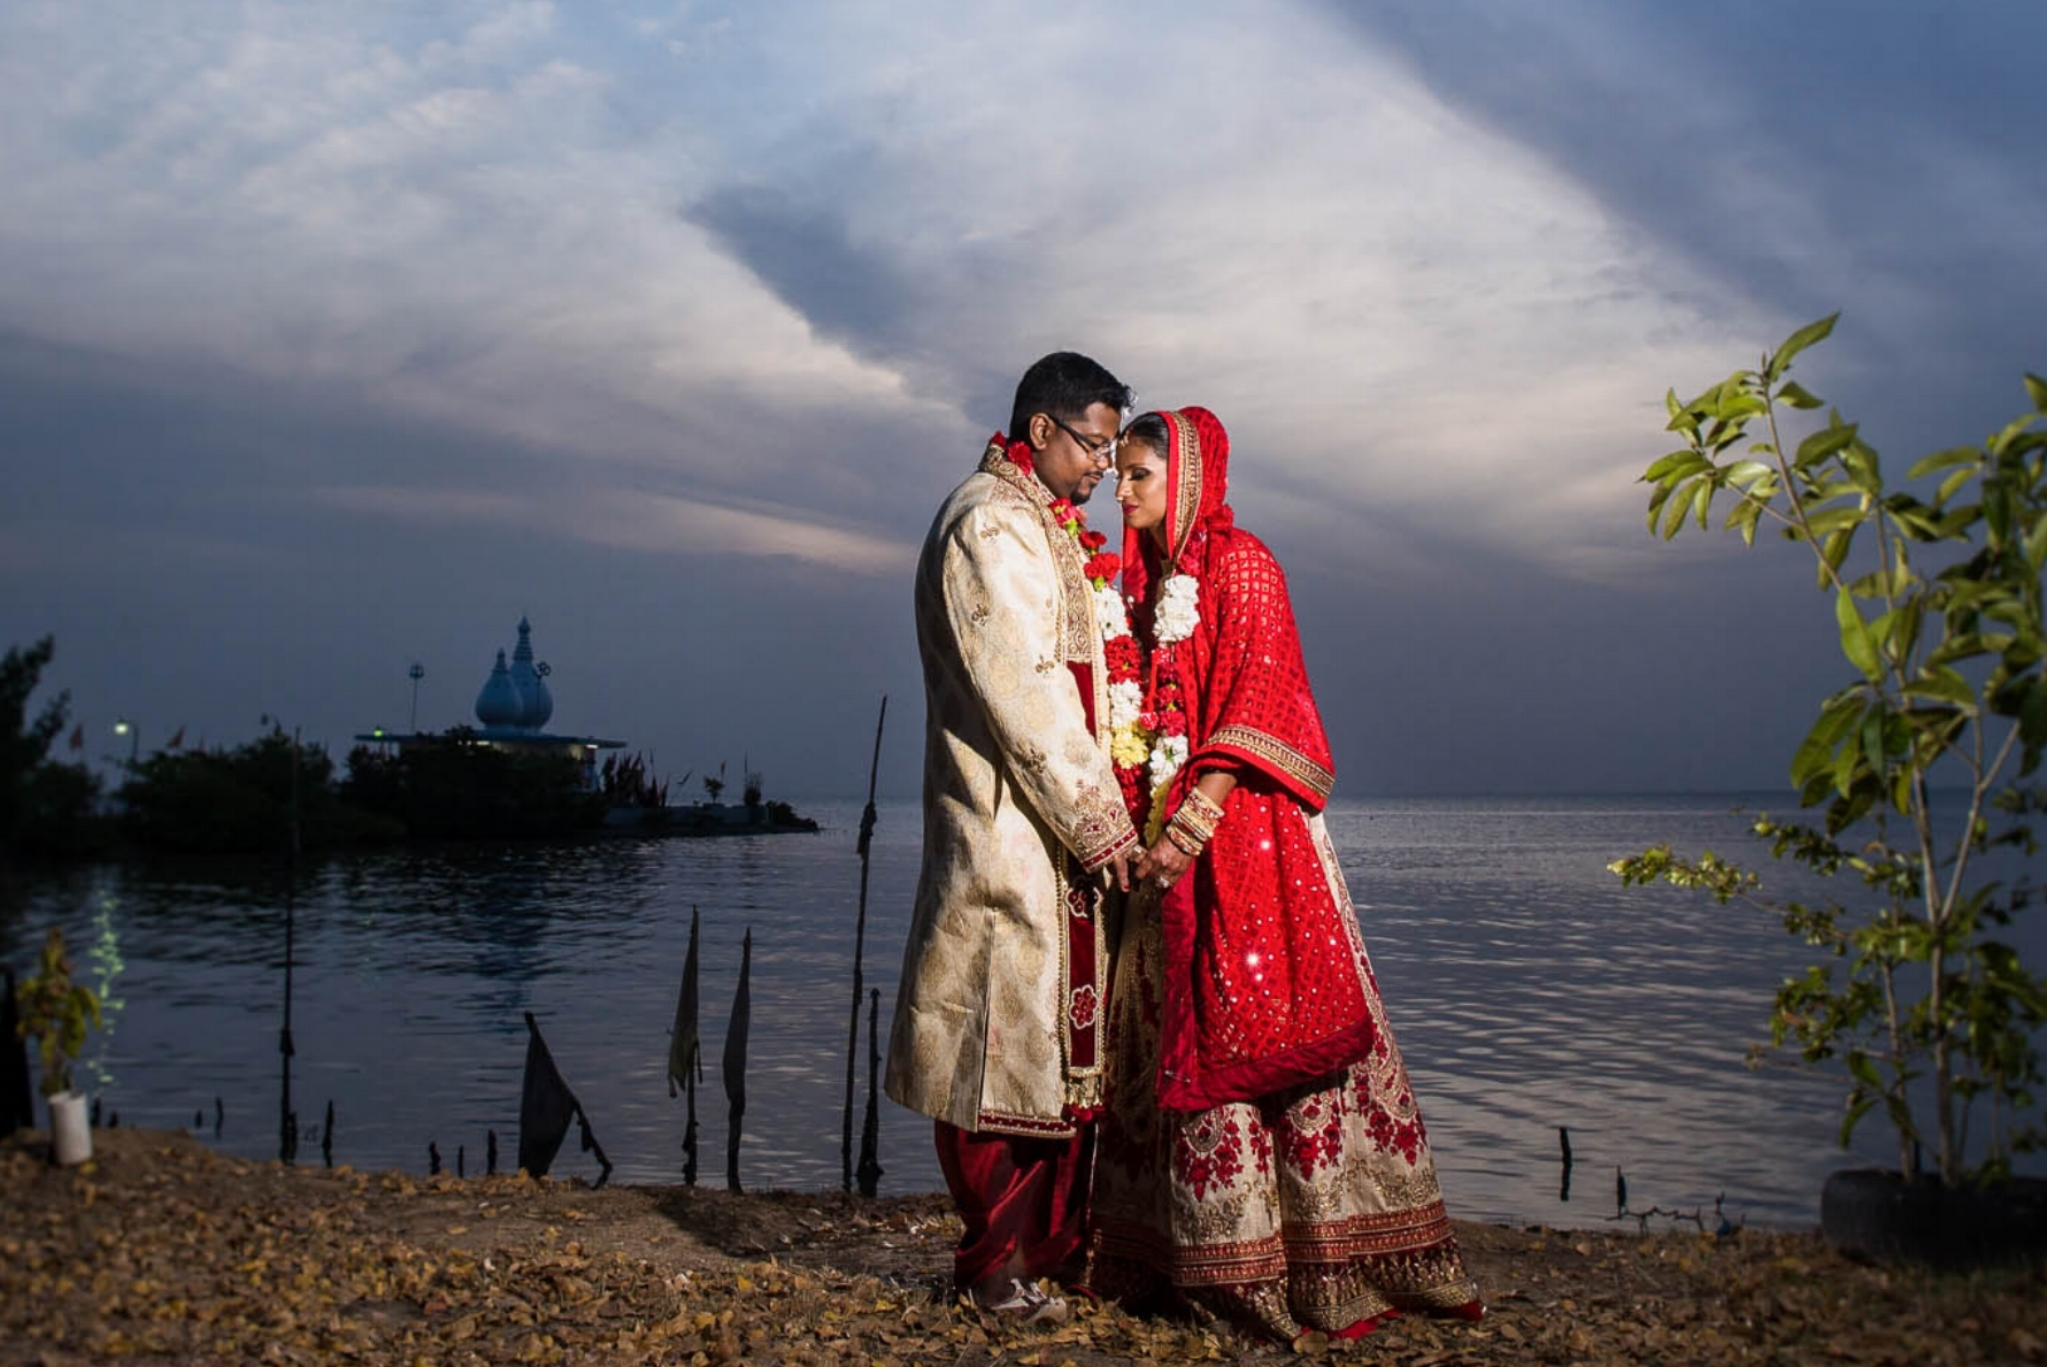 Temply by the Sea Waterloo Trinidad Hindu wedding 06.jpg